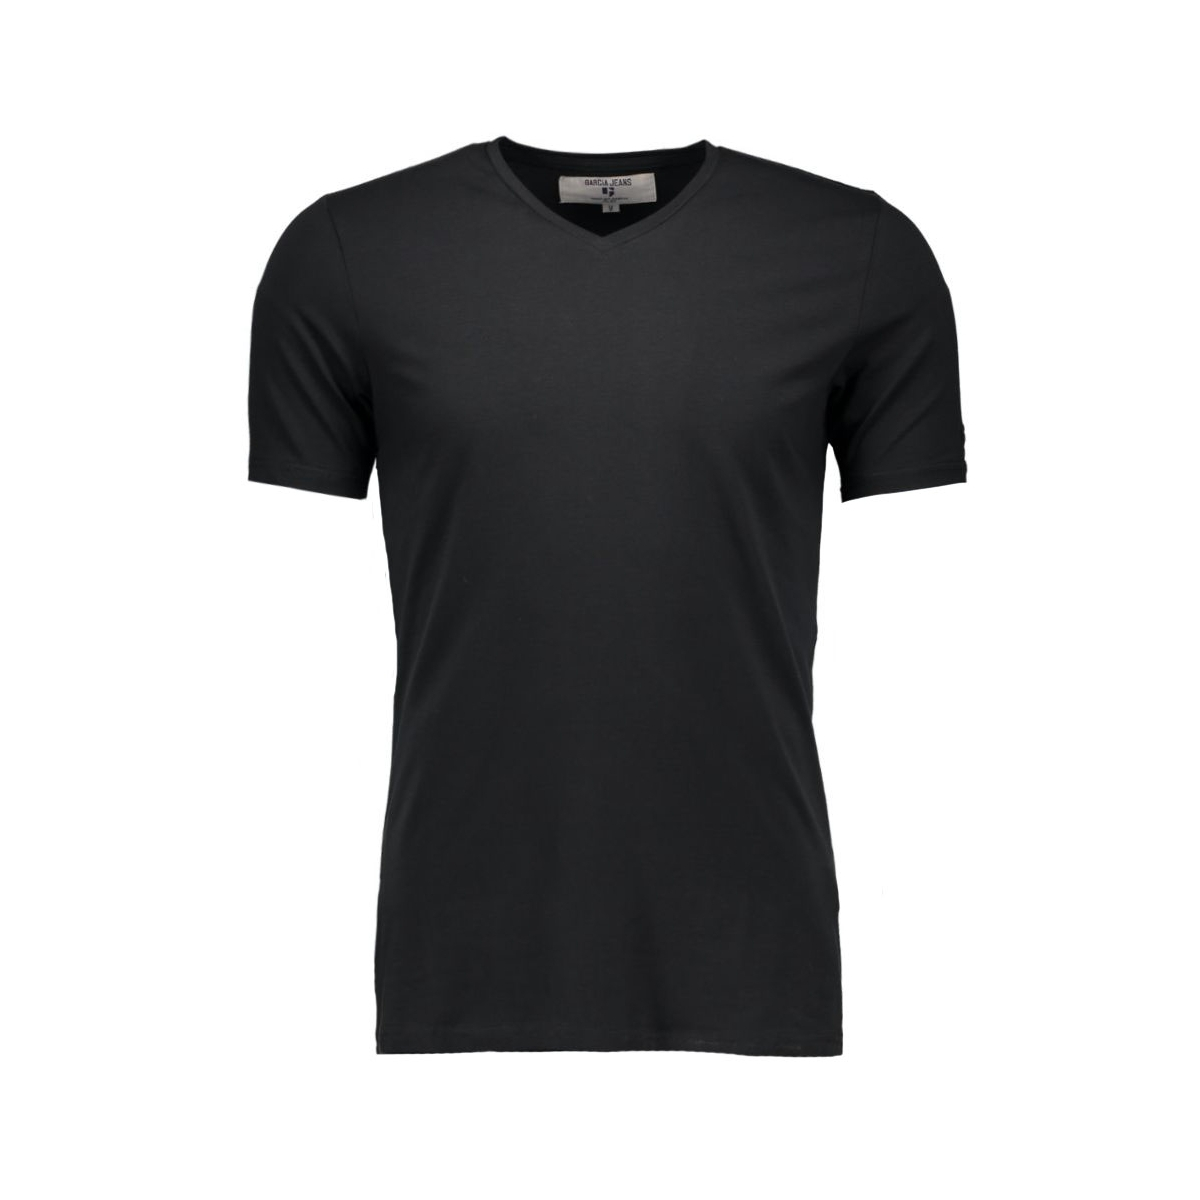 z1067 garcia t-shirt 60 black